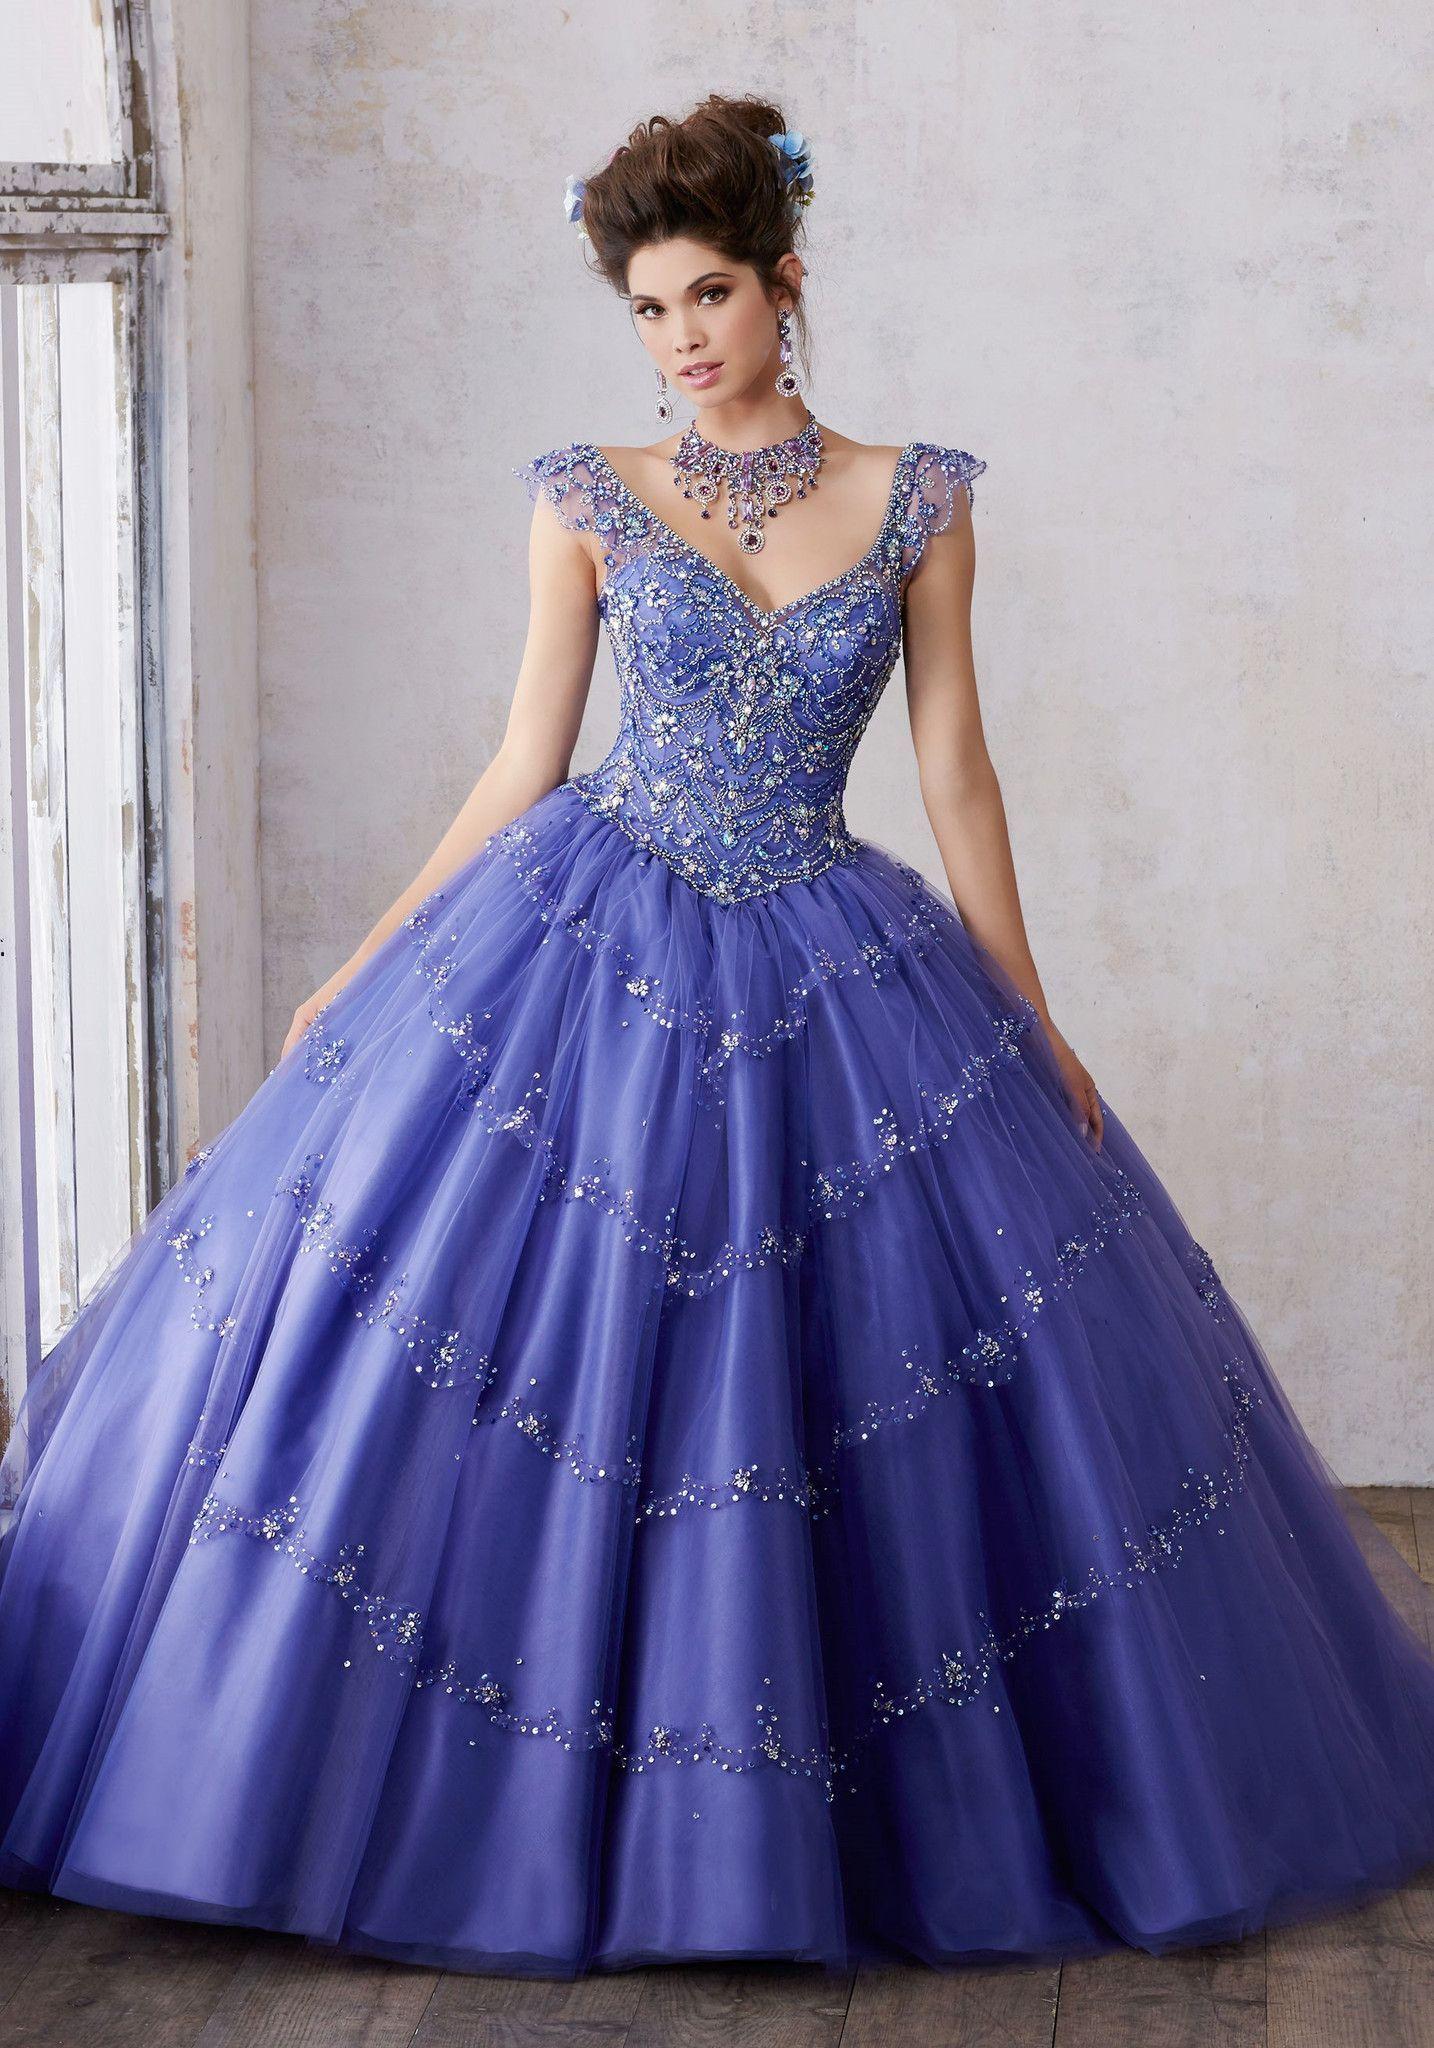 Dorable Vestido De Fiesta Sirena Lee Mori Composición - Ideas de ...